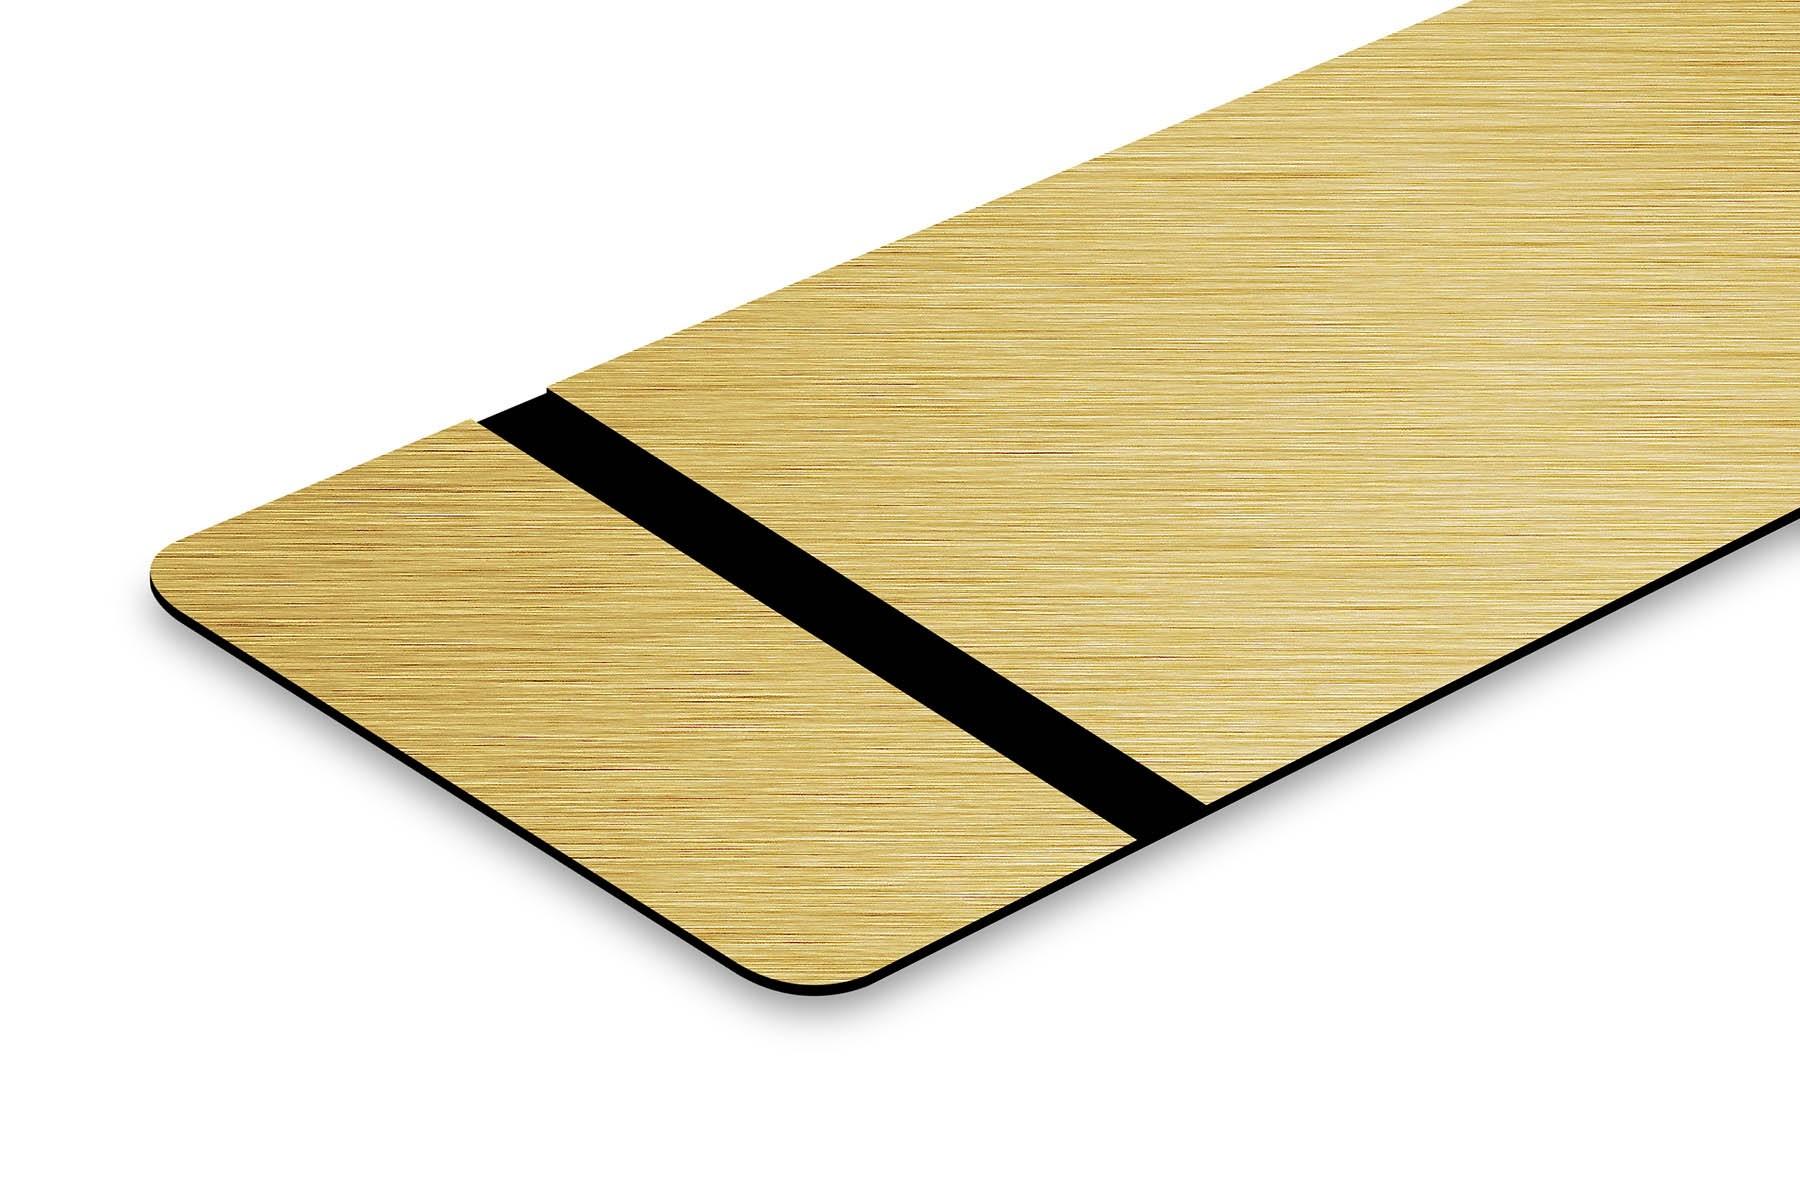 TroLase Foil Gold gebürstet/Schwarz 0,2mm